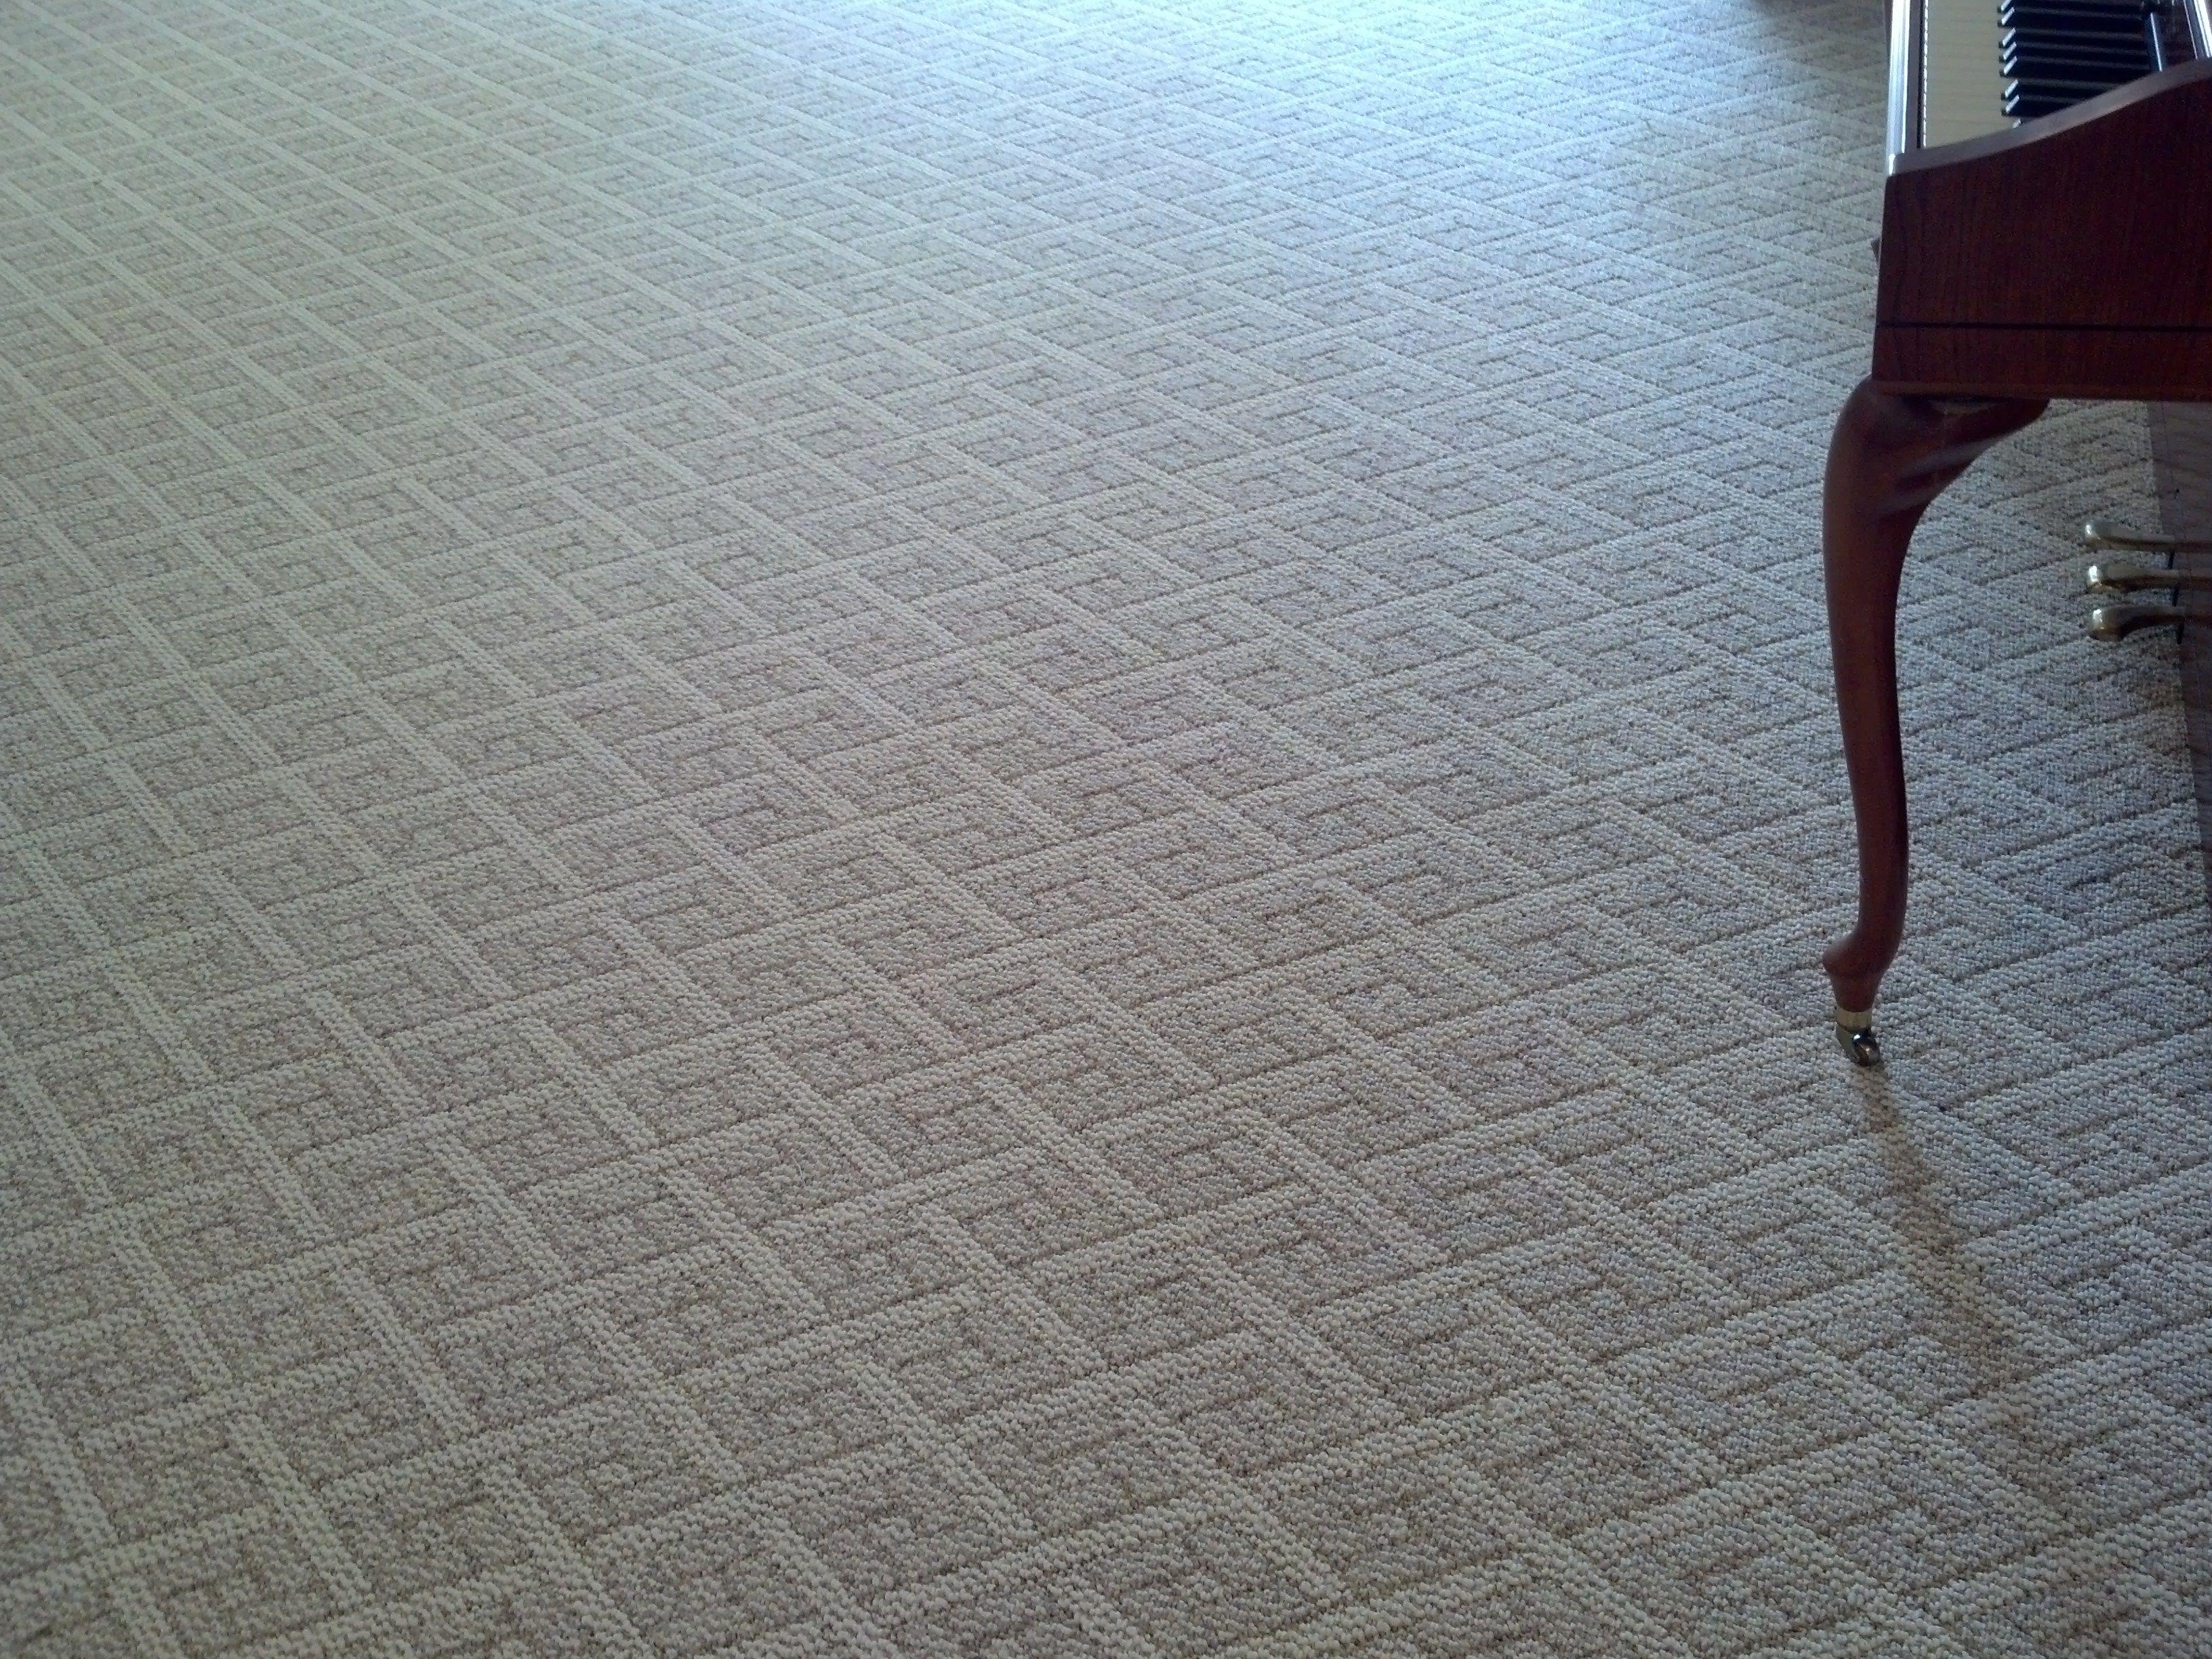 Berber carpet Cincinnati, Oh . South Hampton by Coronet